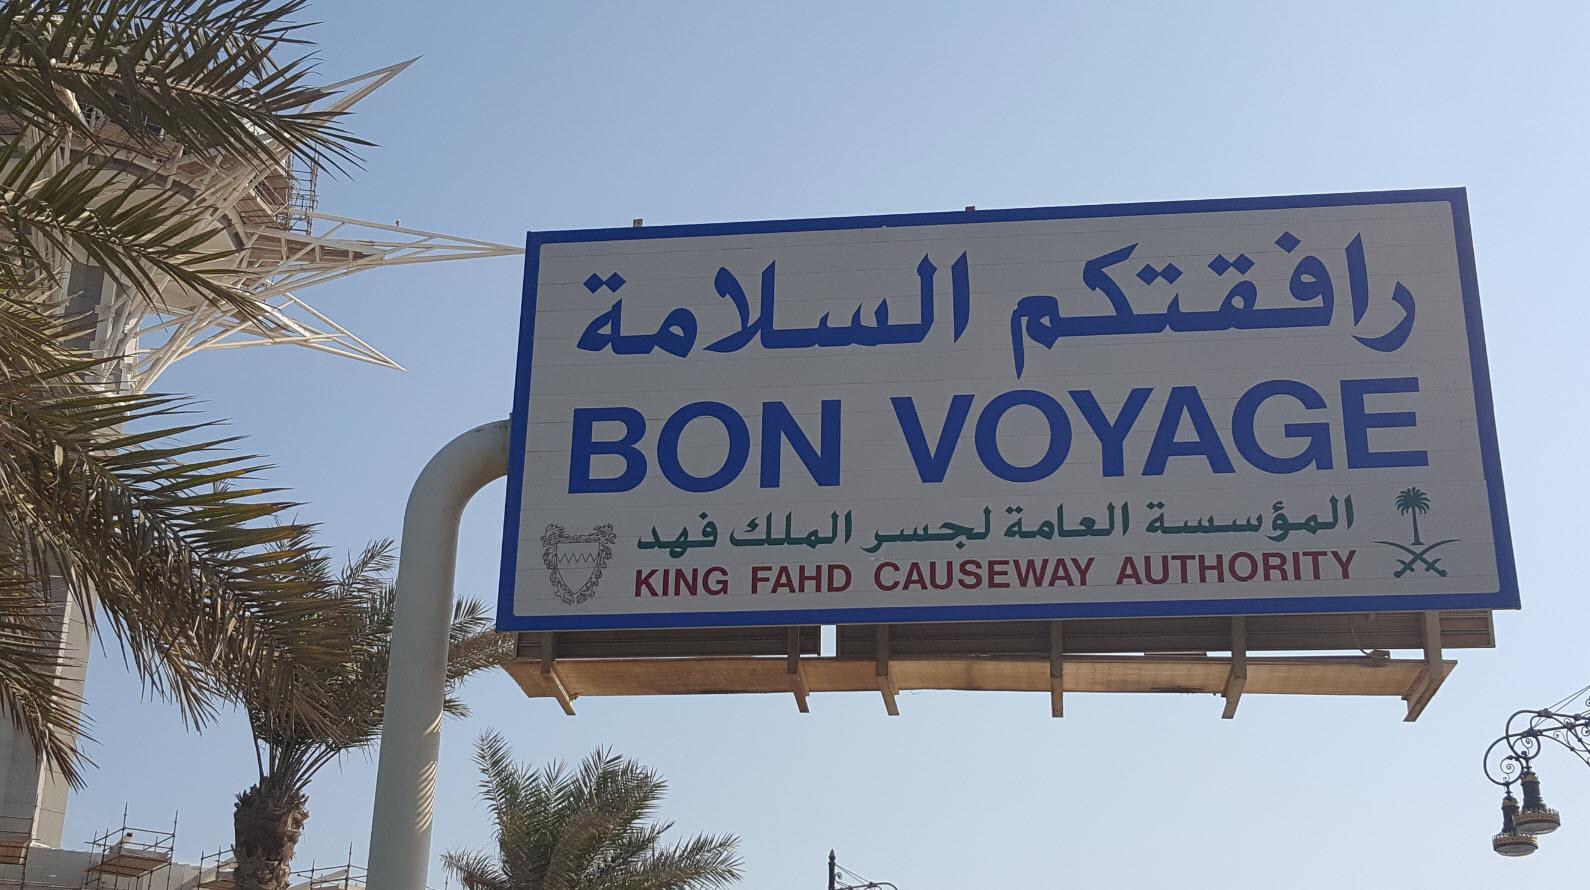 The King Fahd Causeway 3